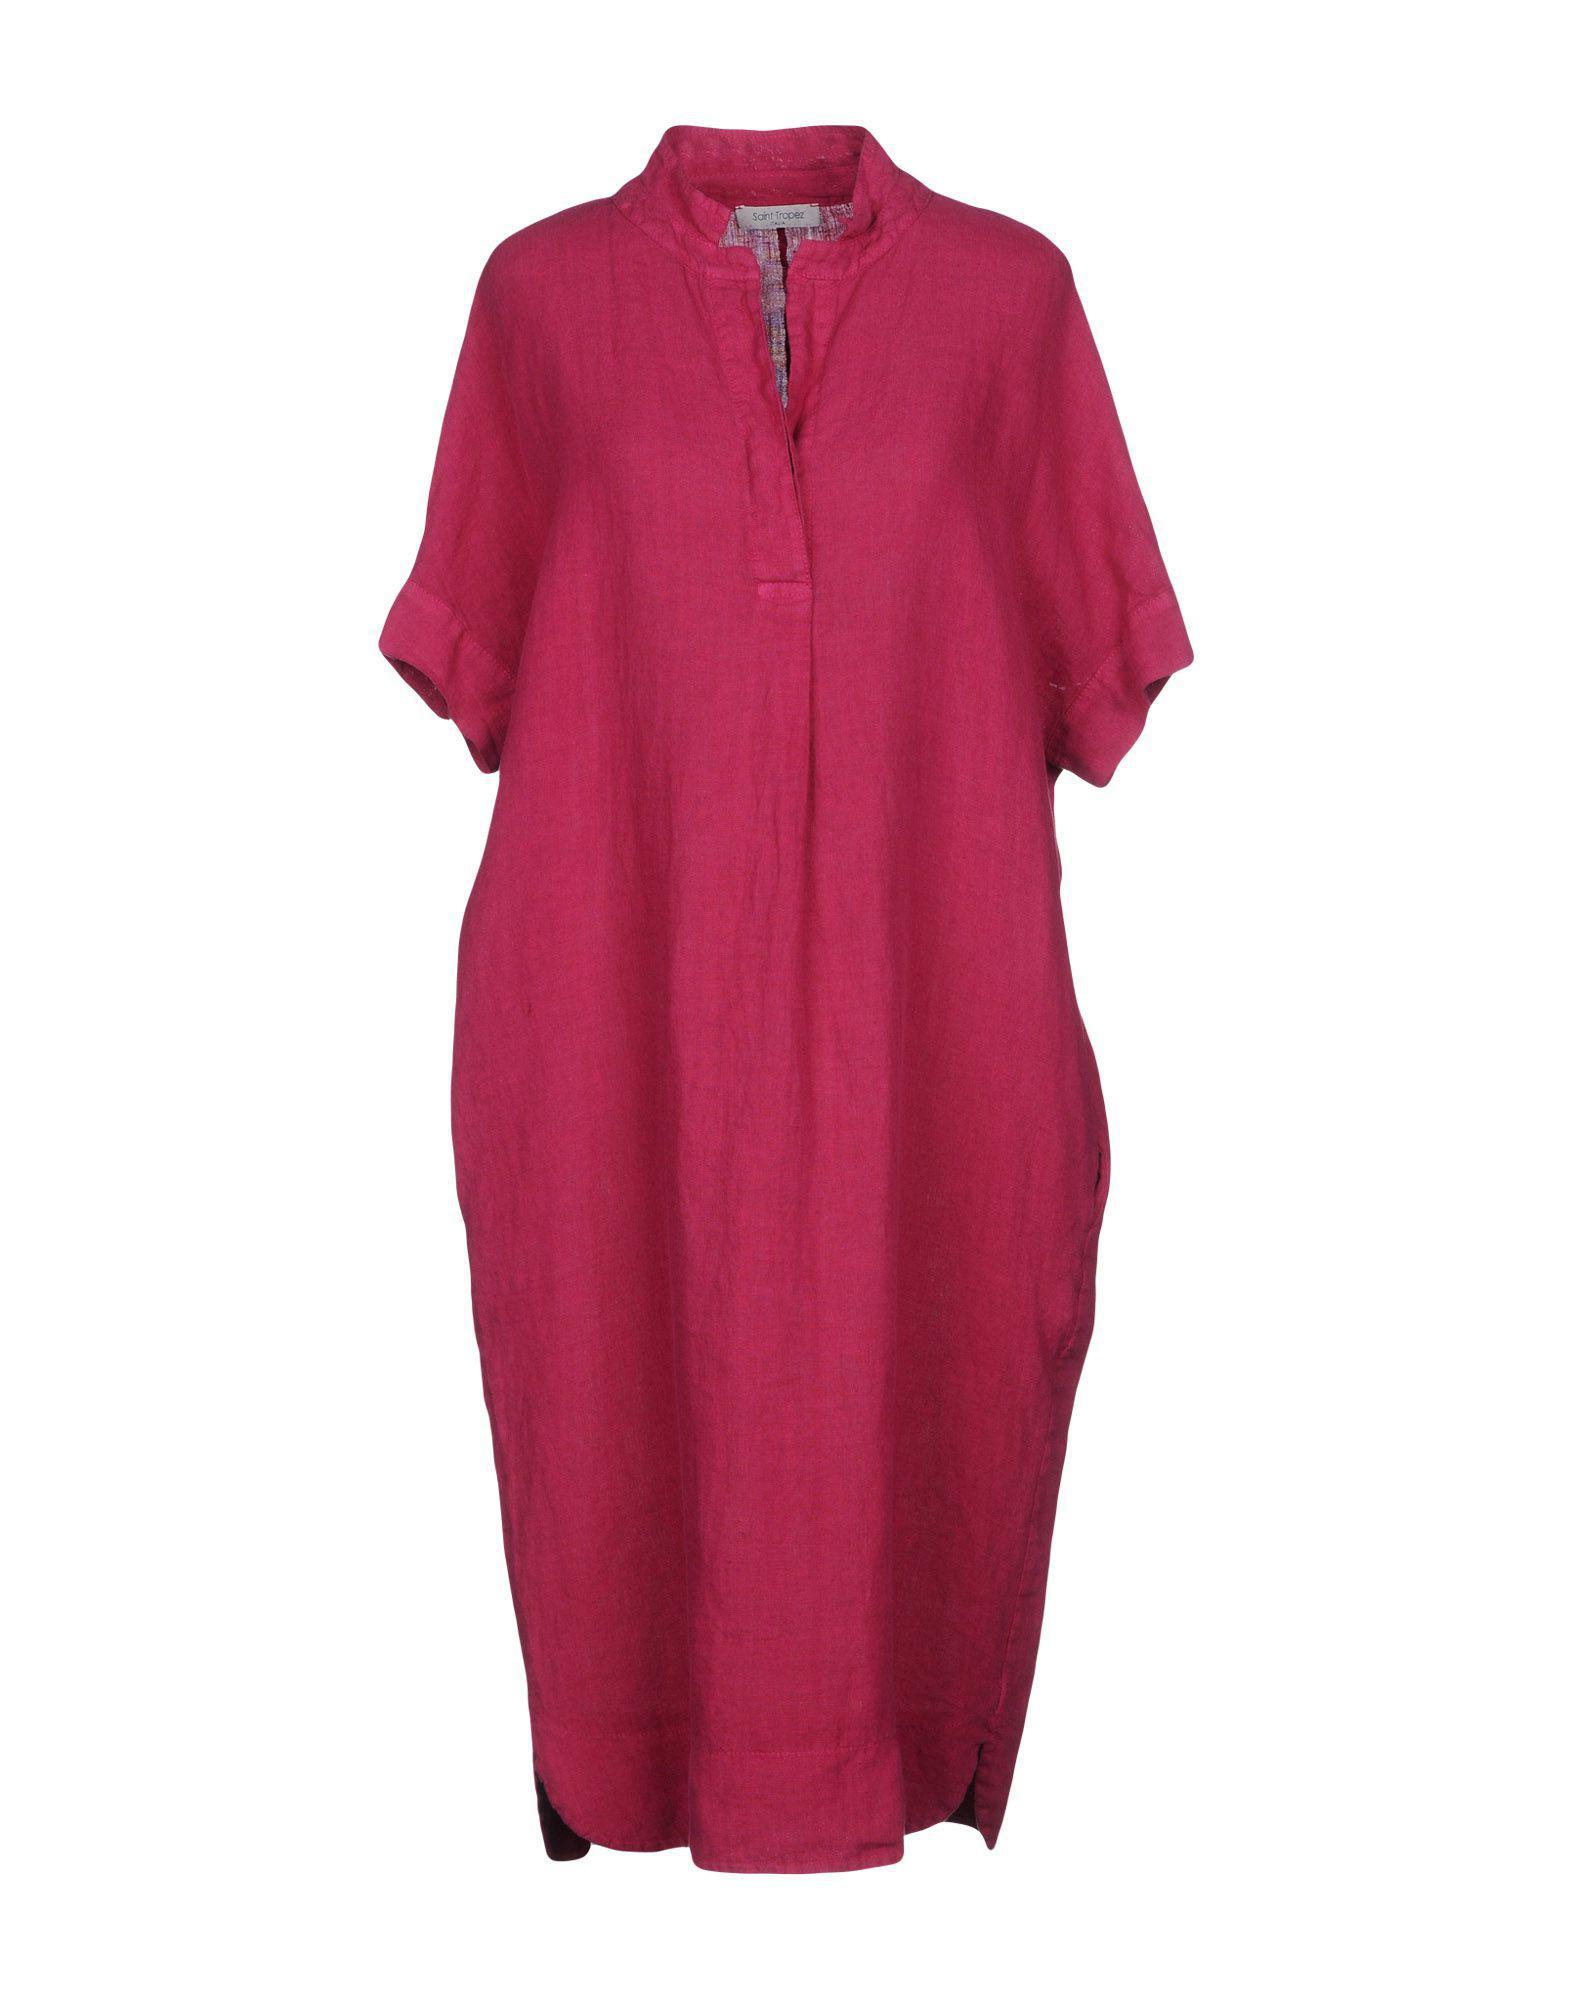 Lyst - Saint Tropez Knee-length Dresses in Pink